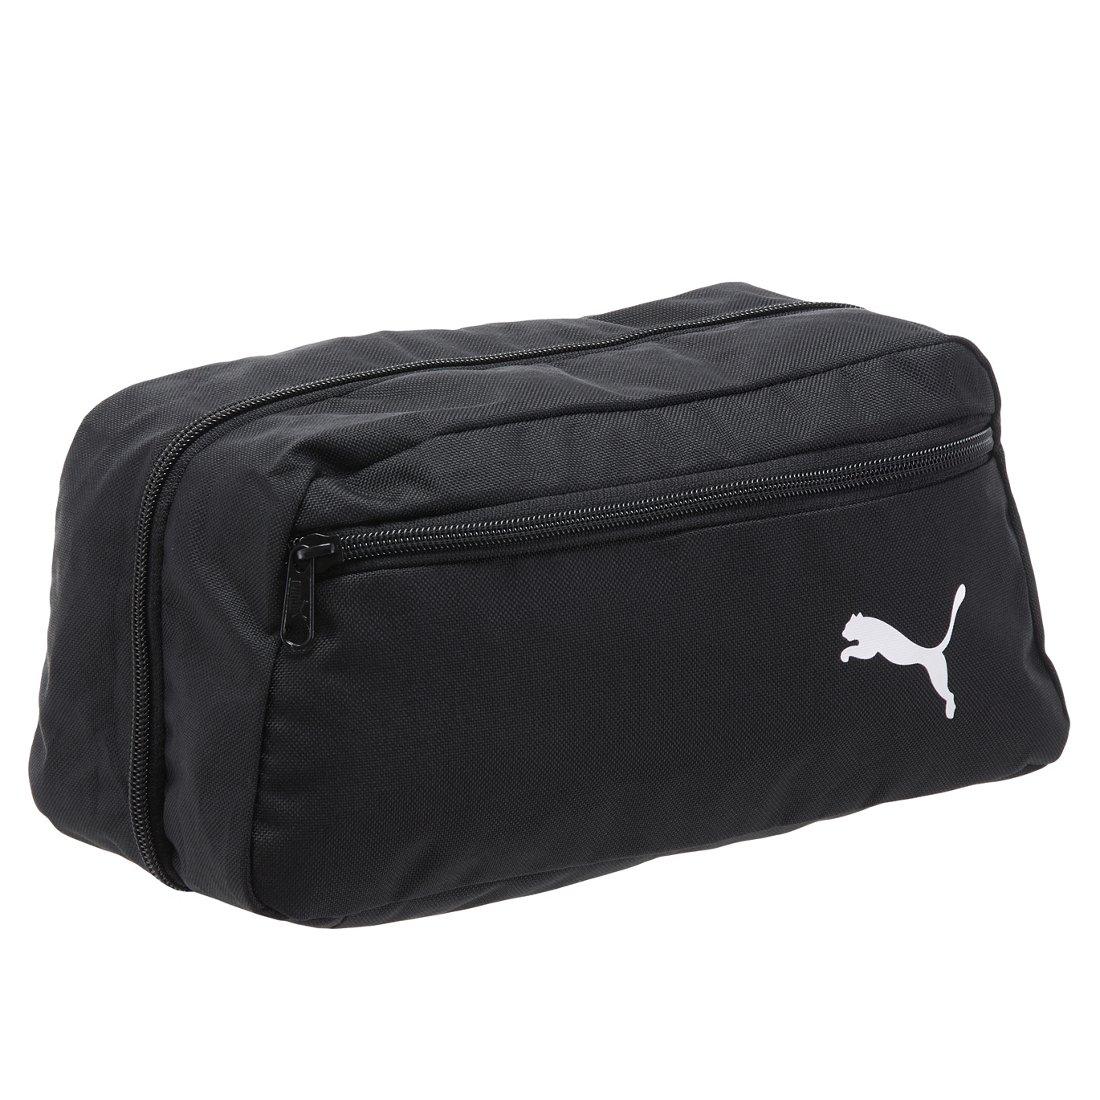 5d6ce2c2dc45 Puma Pro Training II Wash Bag 23 cm - koffer-direkt.de